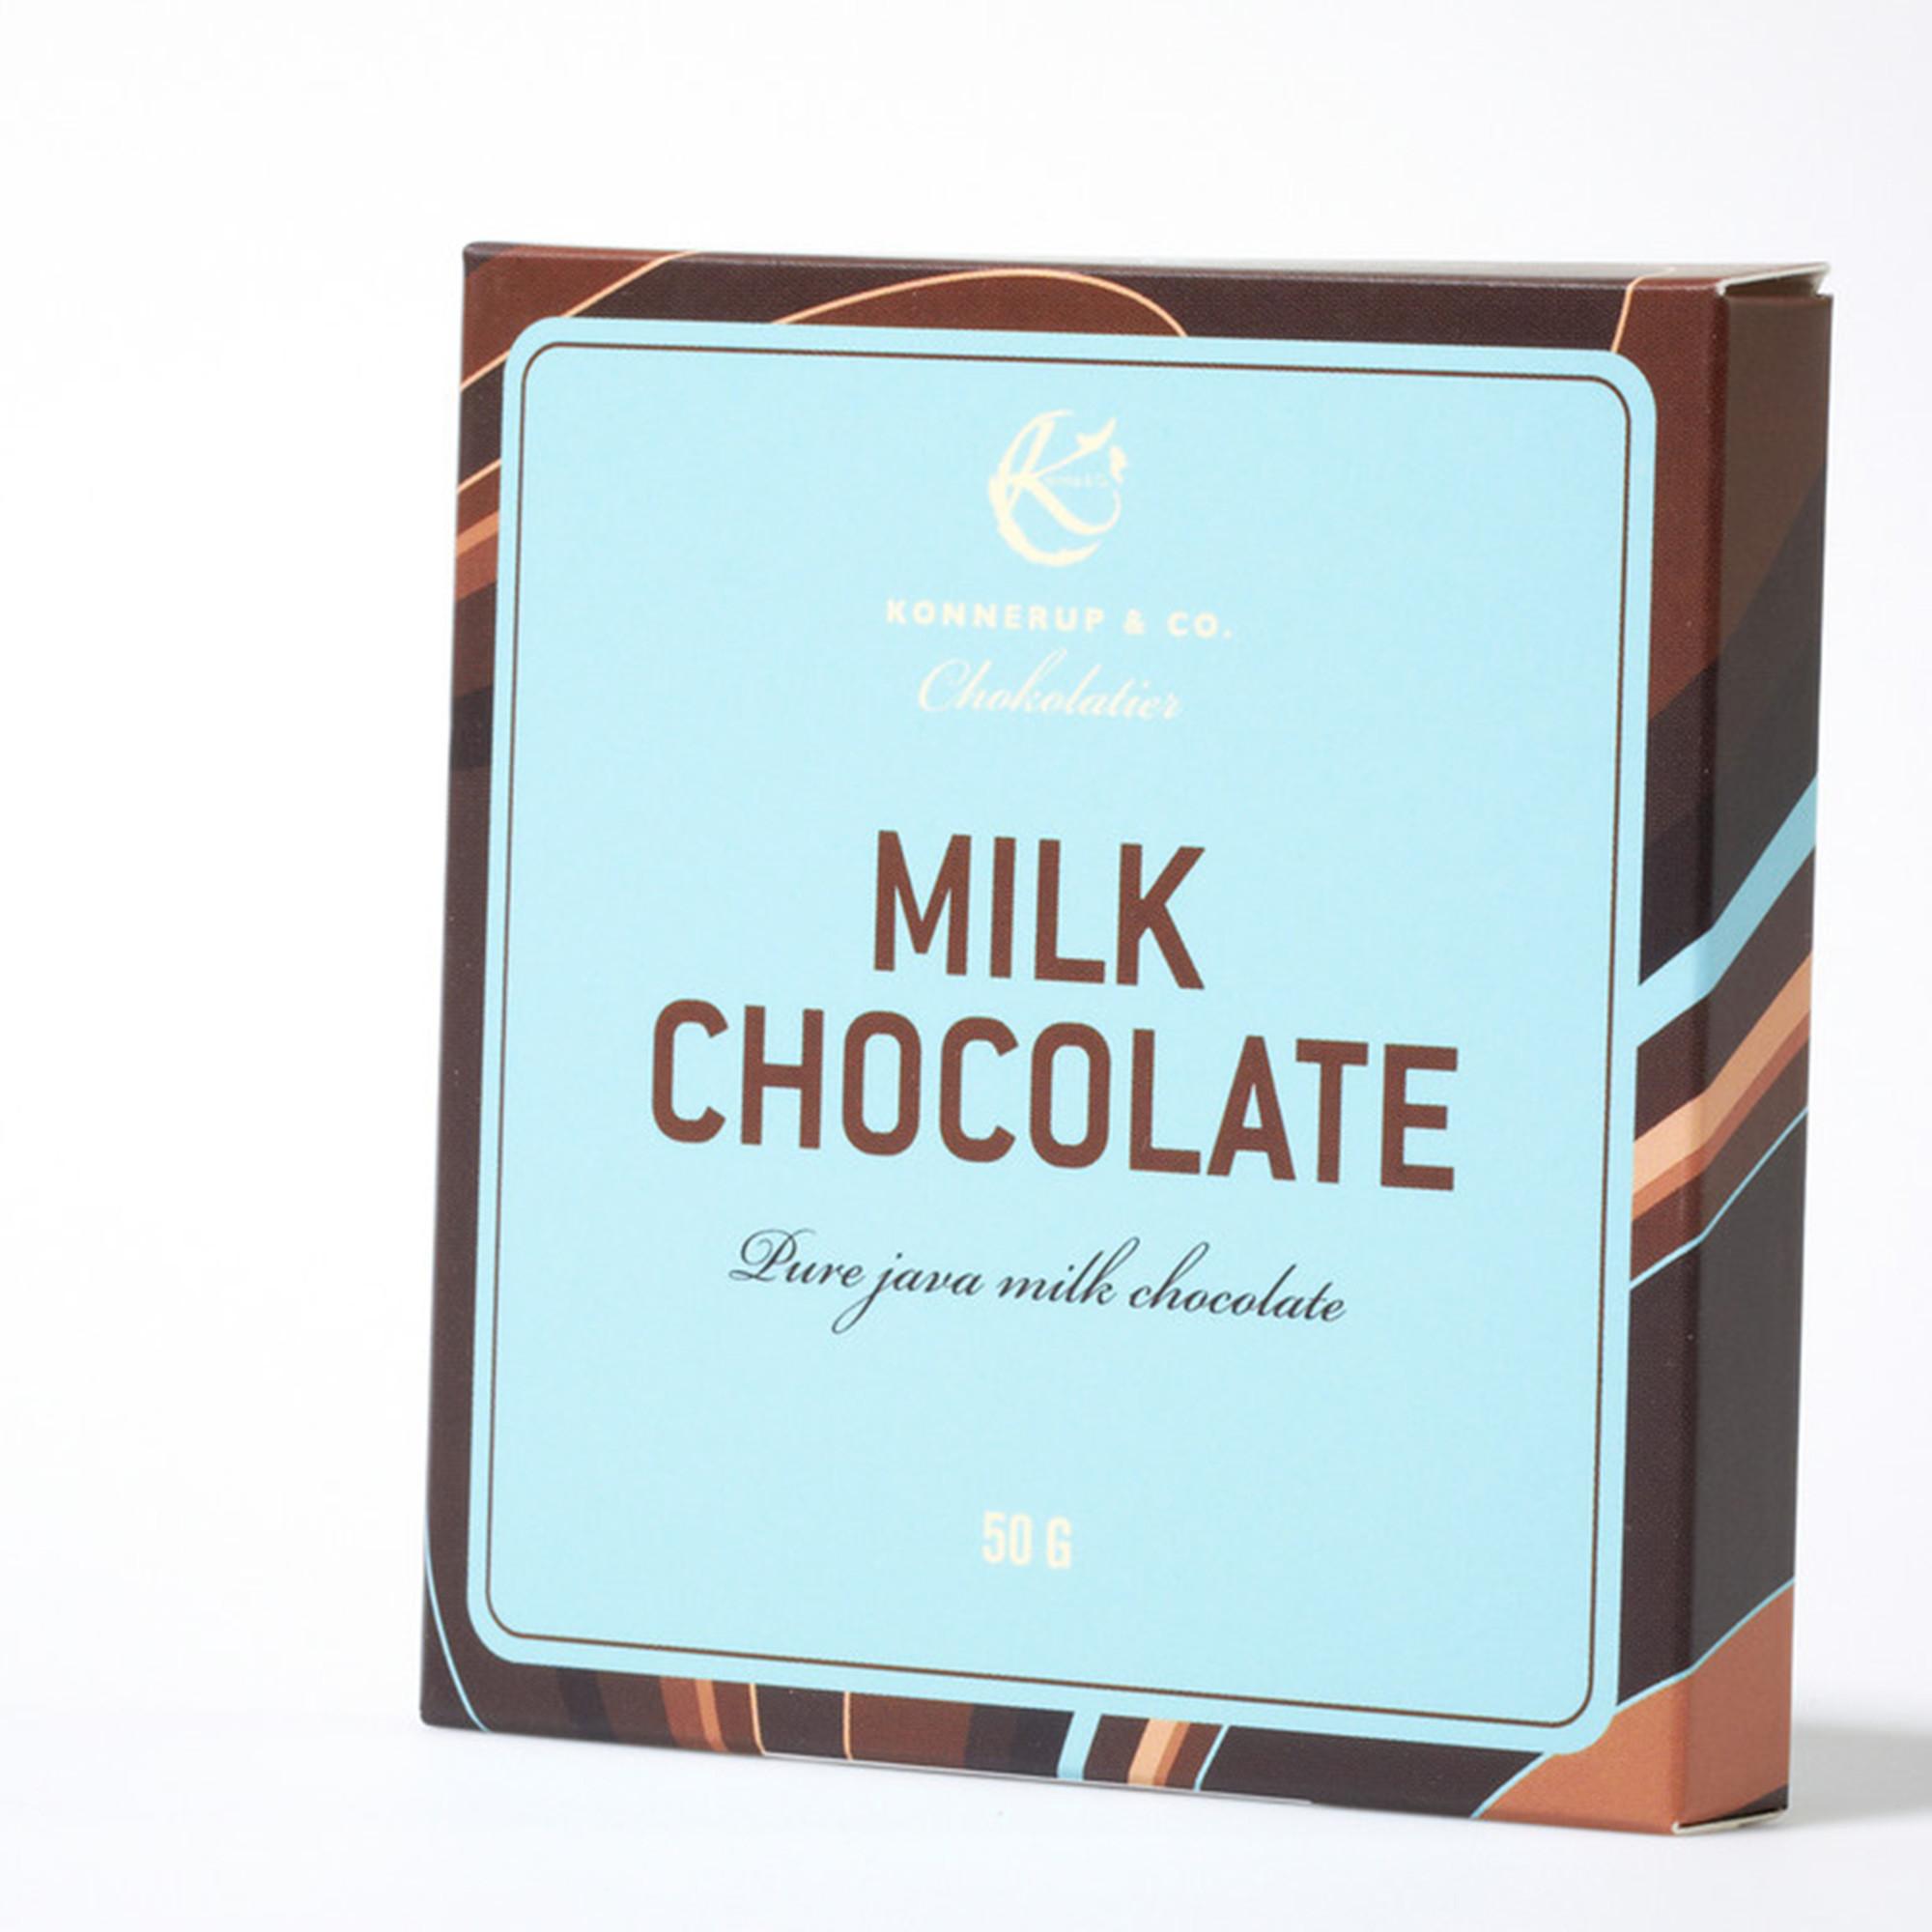 Konnerup & Co chokolade fra NORU